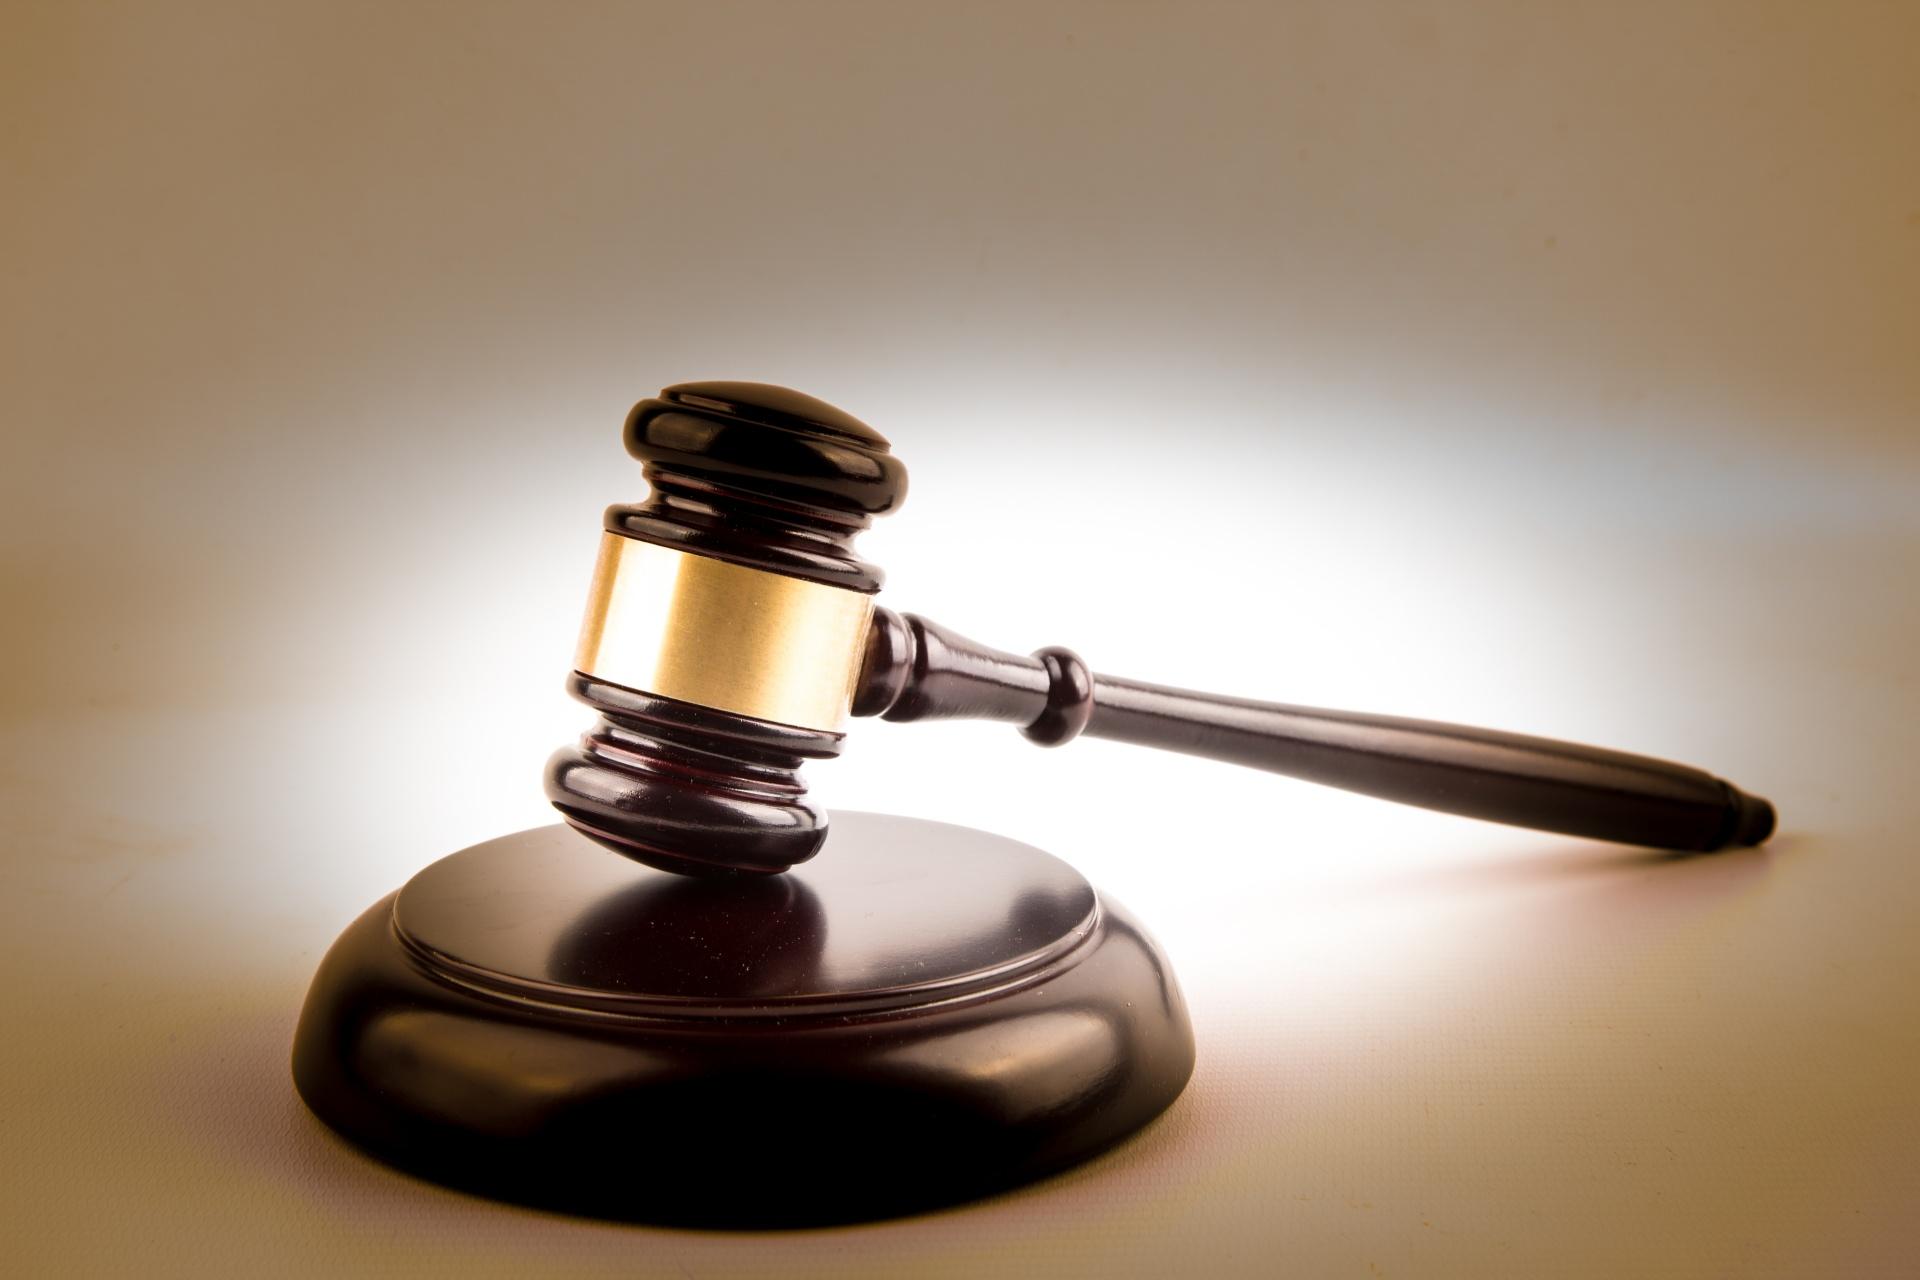 judge gavel 1461291738X4g - قاضی فدرال درخواست ریپل برای دسترسی به سابقه معاملاتی کارکنان SEC را رد می کند